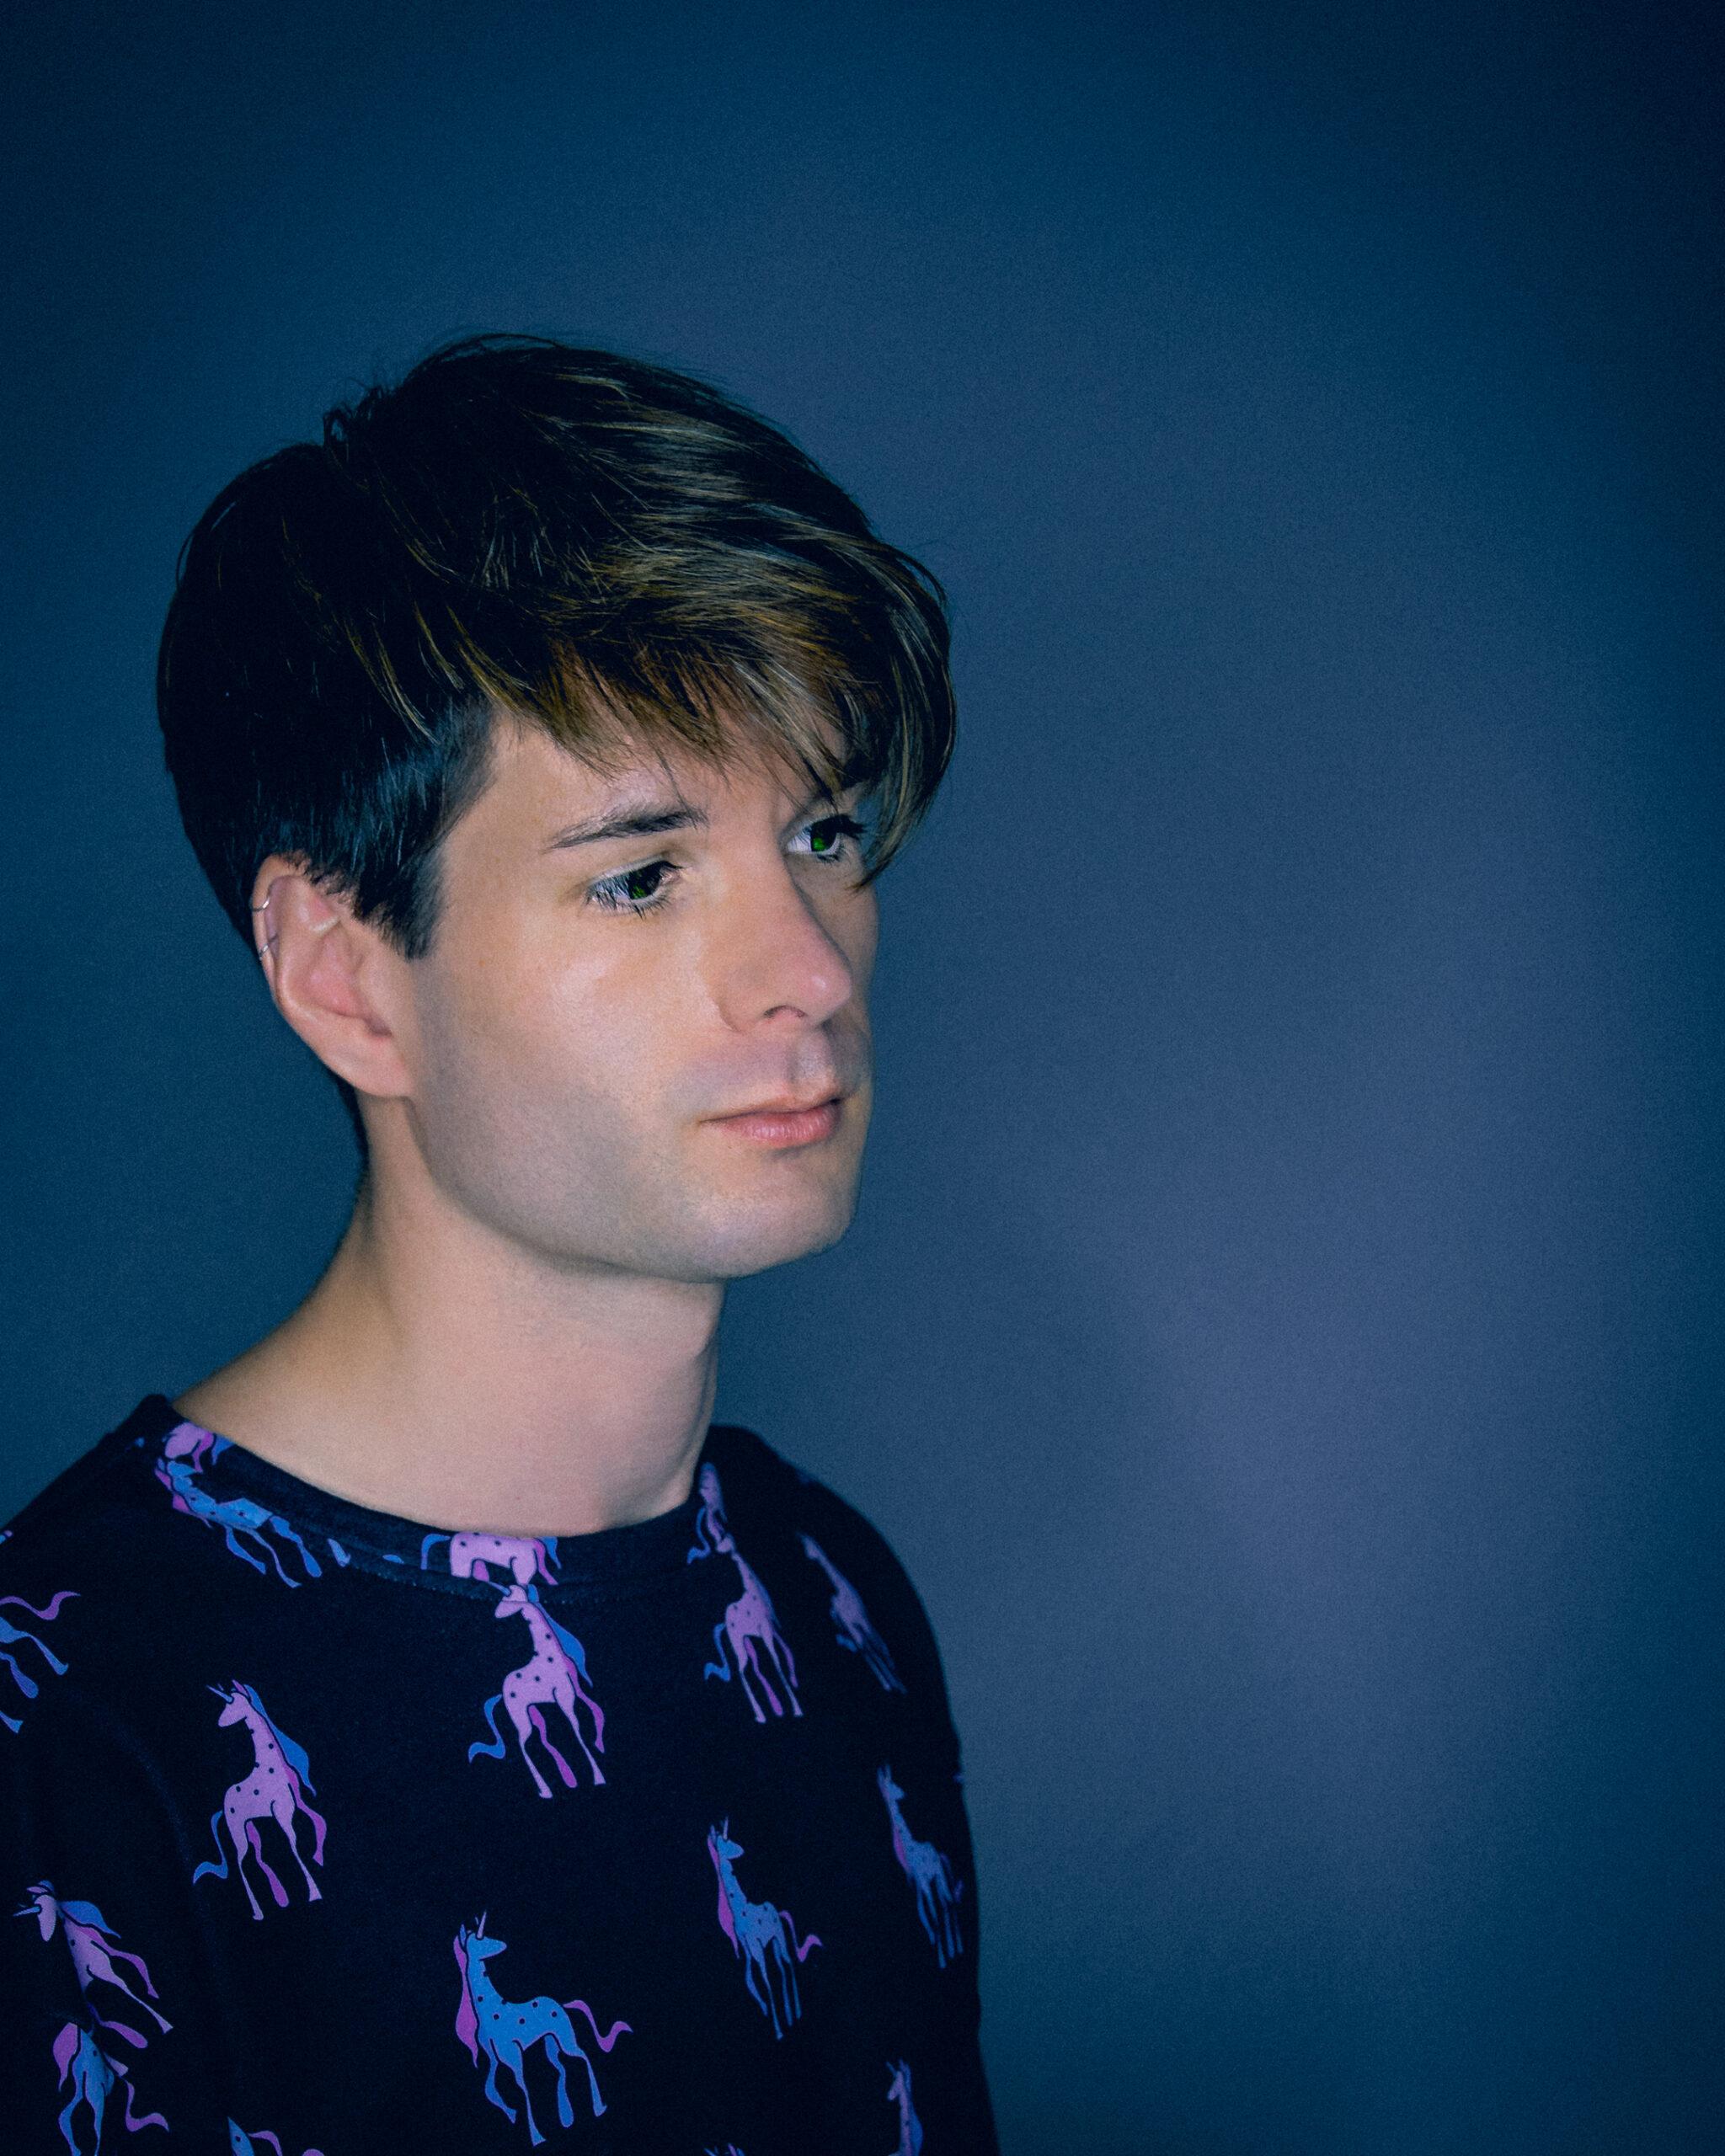 Zaccy Self Portrait Wearing Pastel Goth Unicorn Sweatshirt